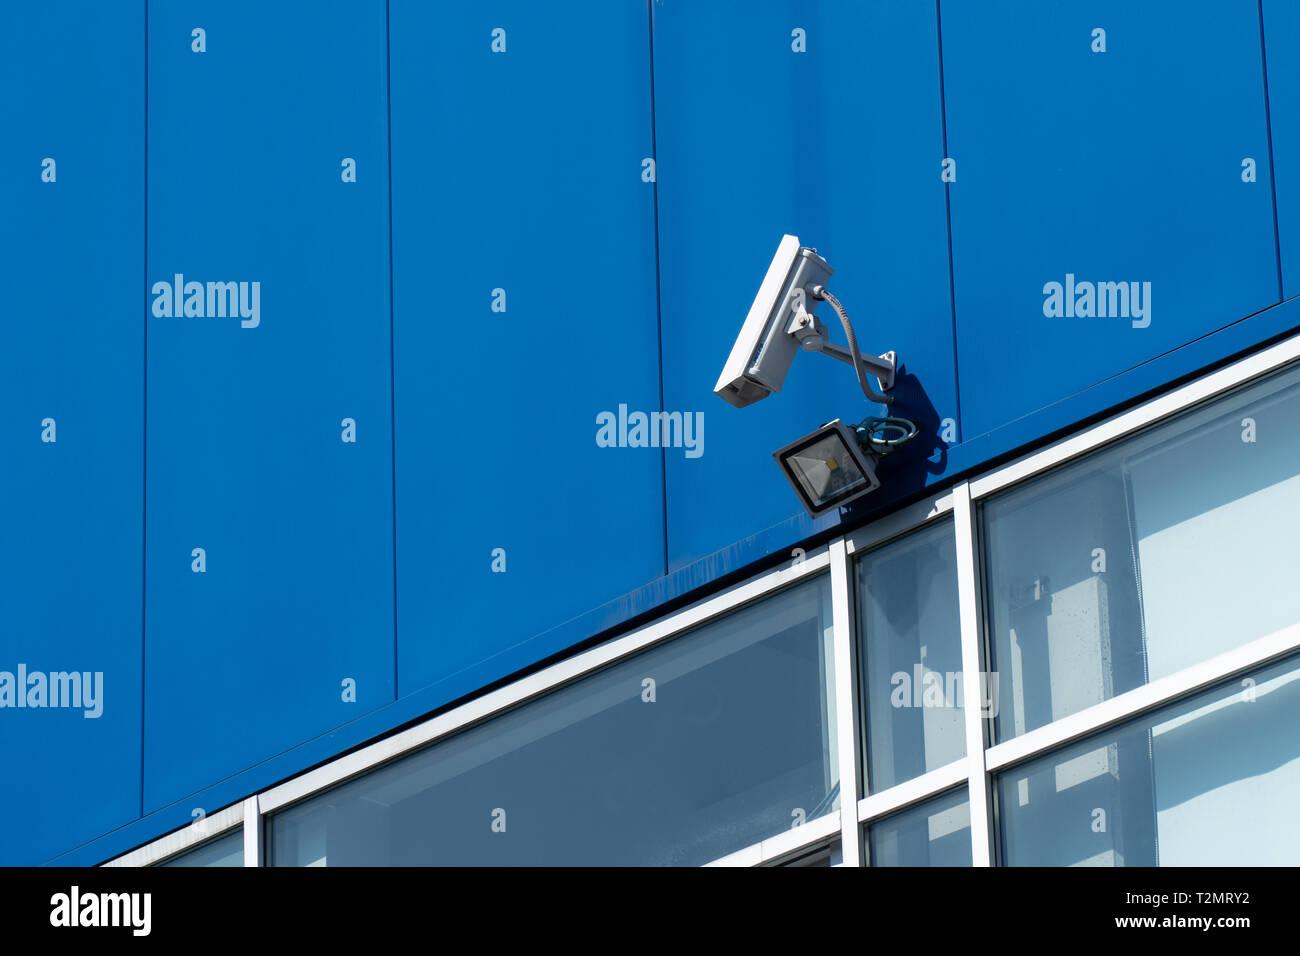 Surveillance concept. Security camera on blue building facade - Stock Image